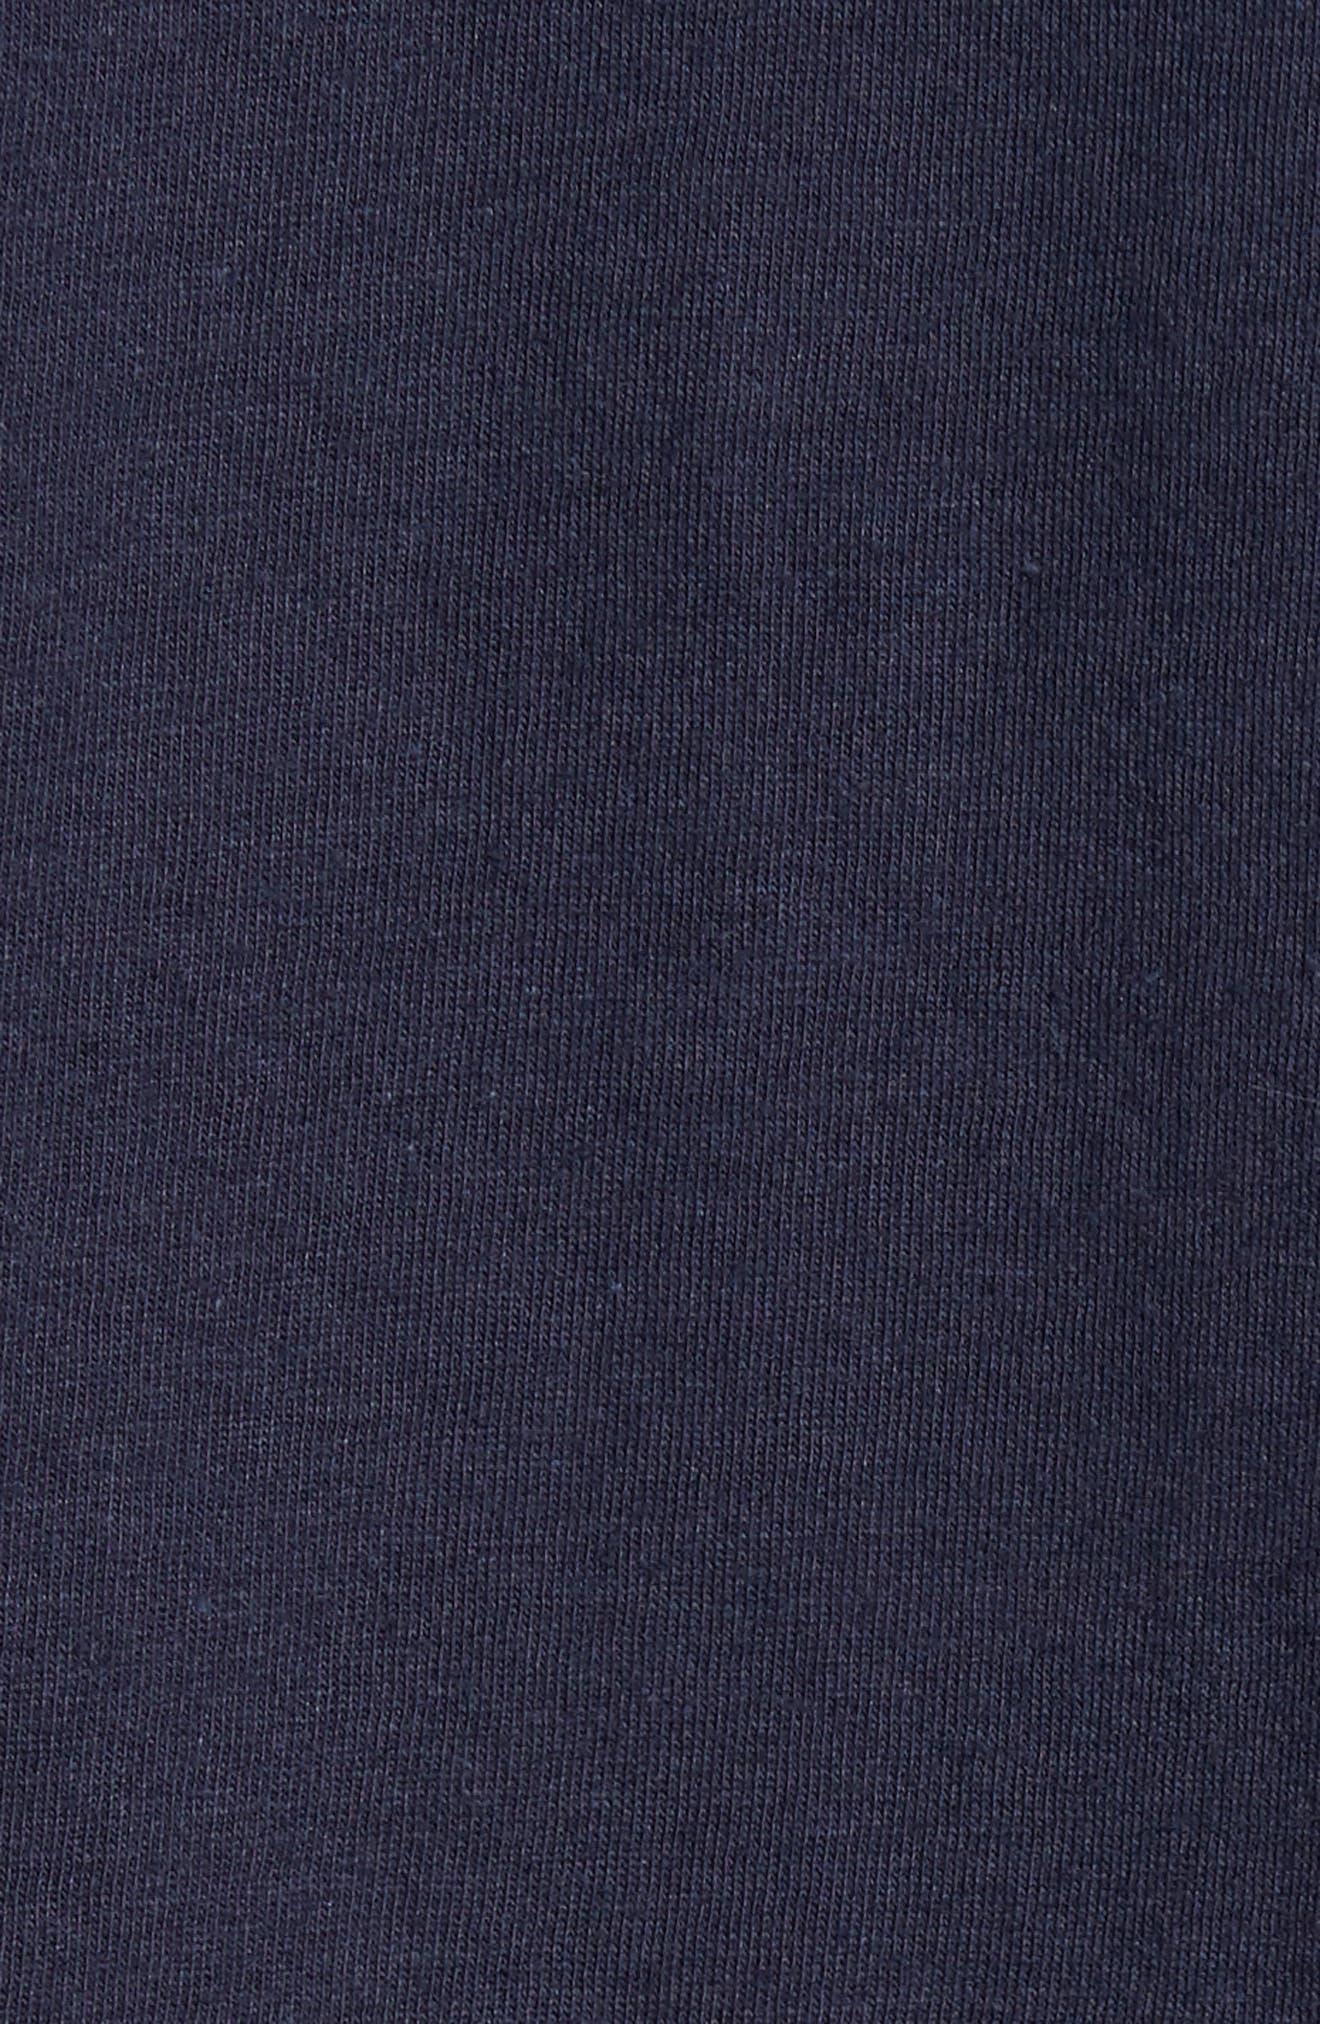 Sea Graphic T-Shirt,                             Alternate thumbnail 10, color,